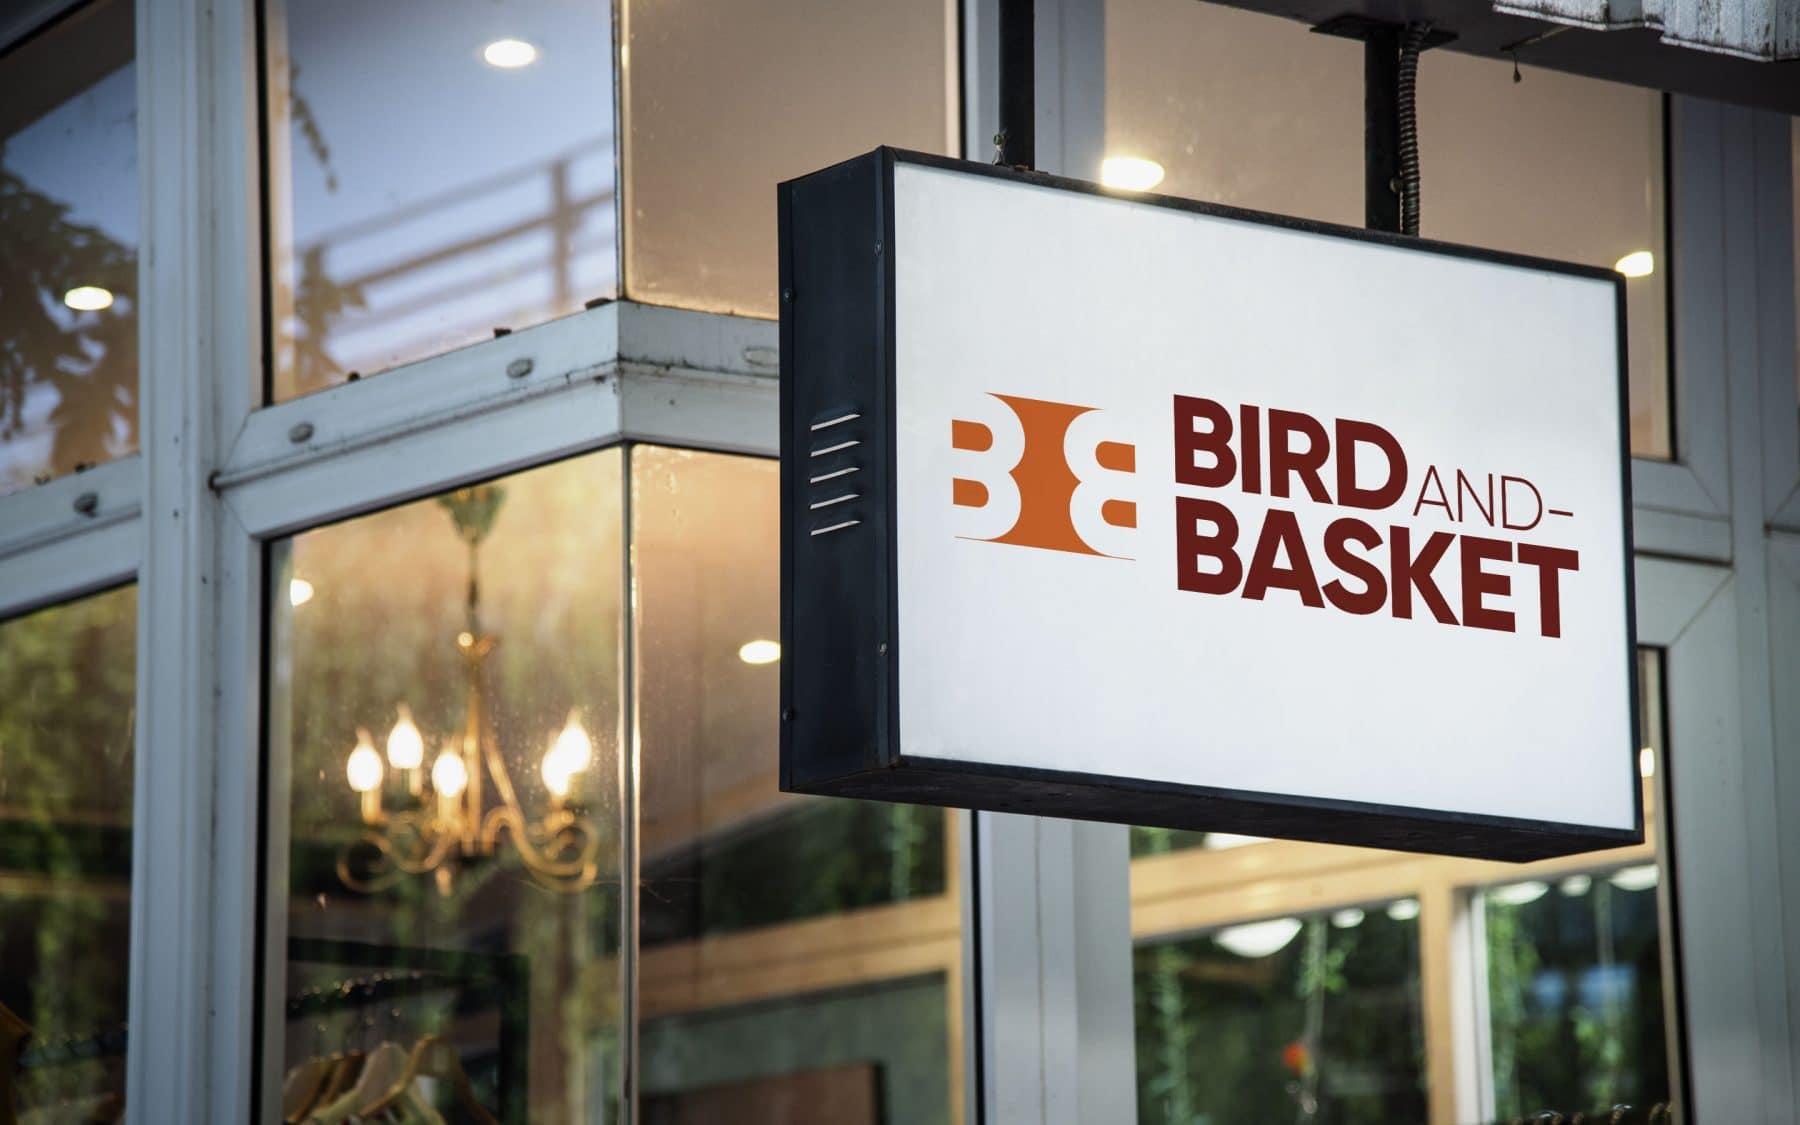 Birdandbasket 3